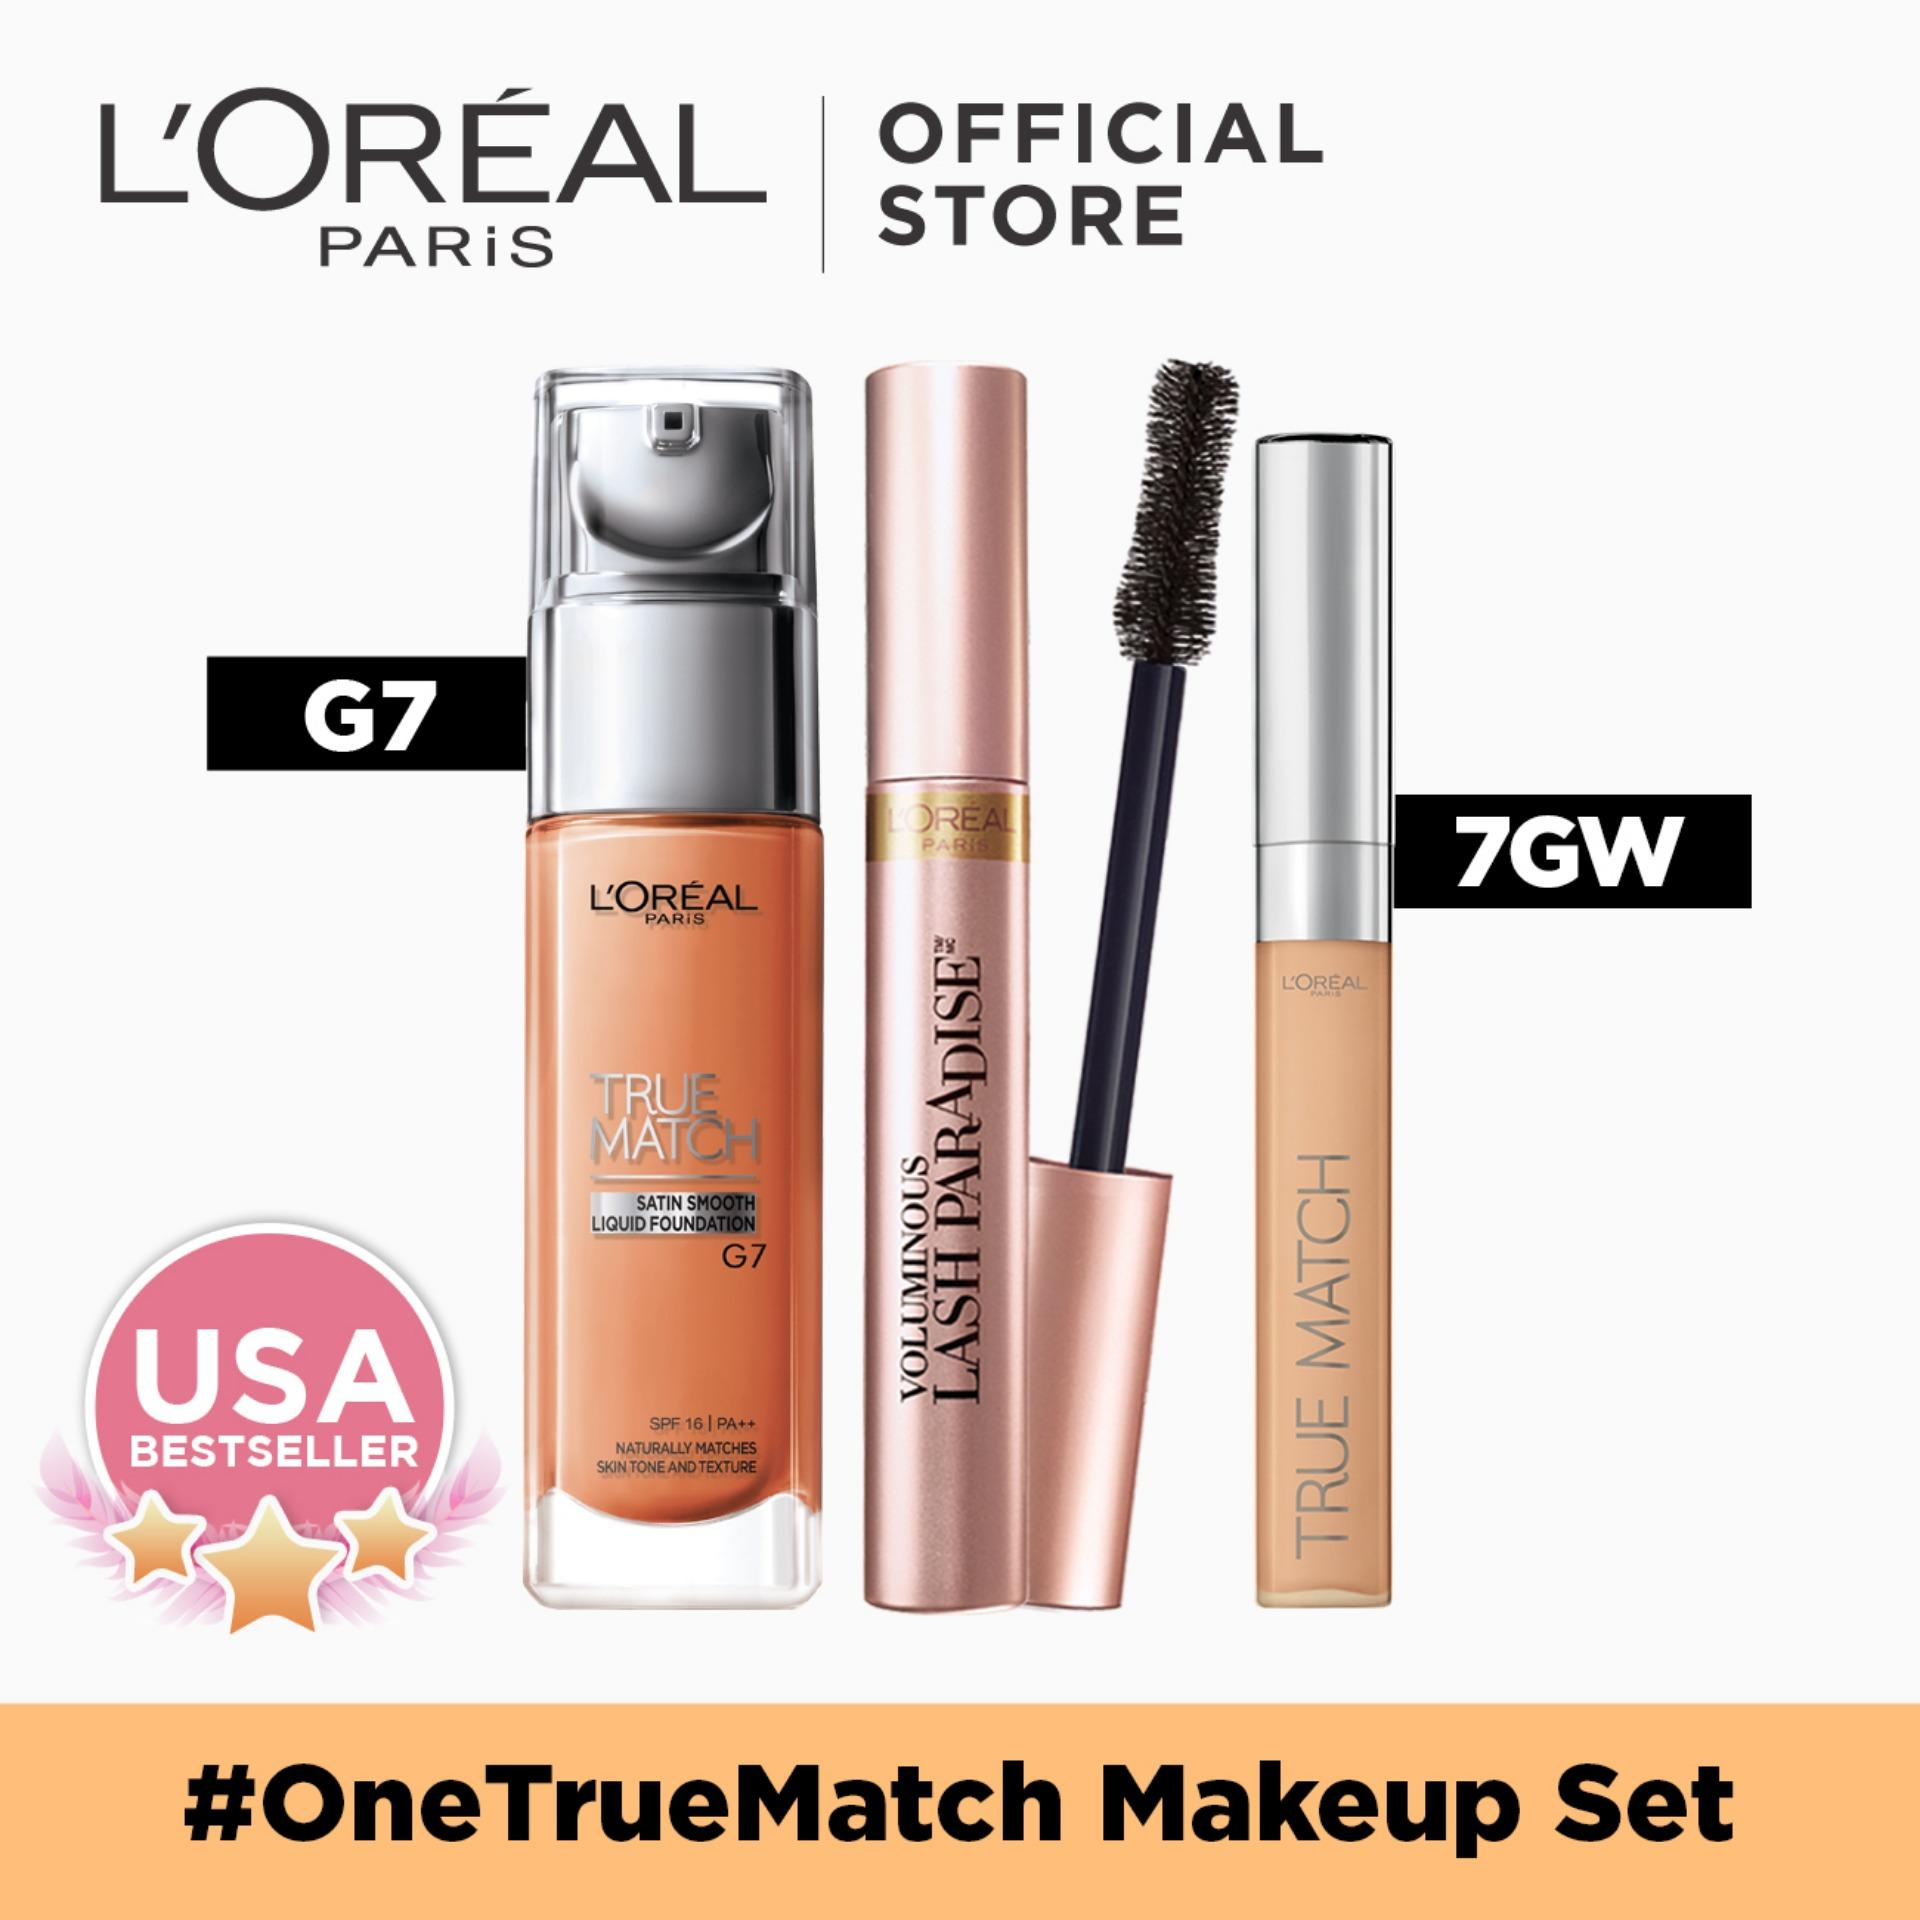 #OneTrueMatch Makeup Set by LOreal Paris Philippines